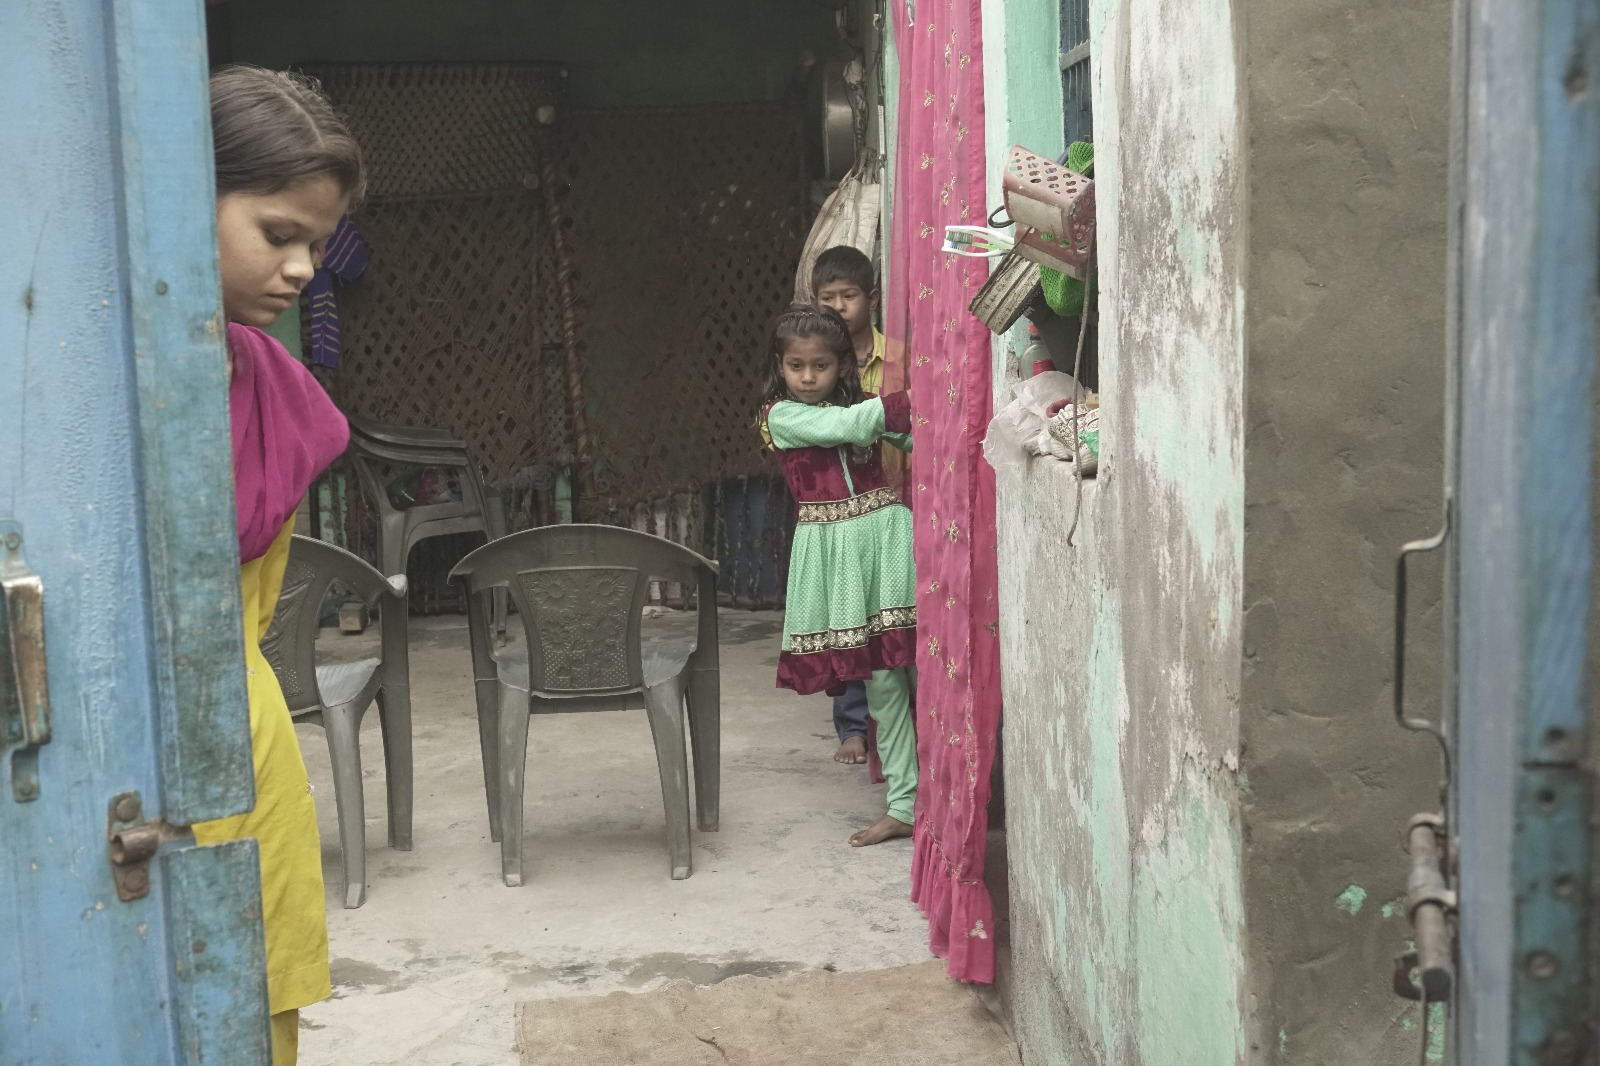 Kamruddin's children Rukhsar and Zahir at their grandmother's place. Credit: Jyotsna Singh